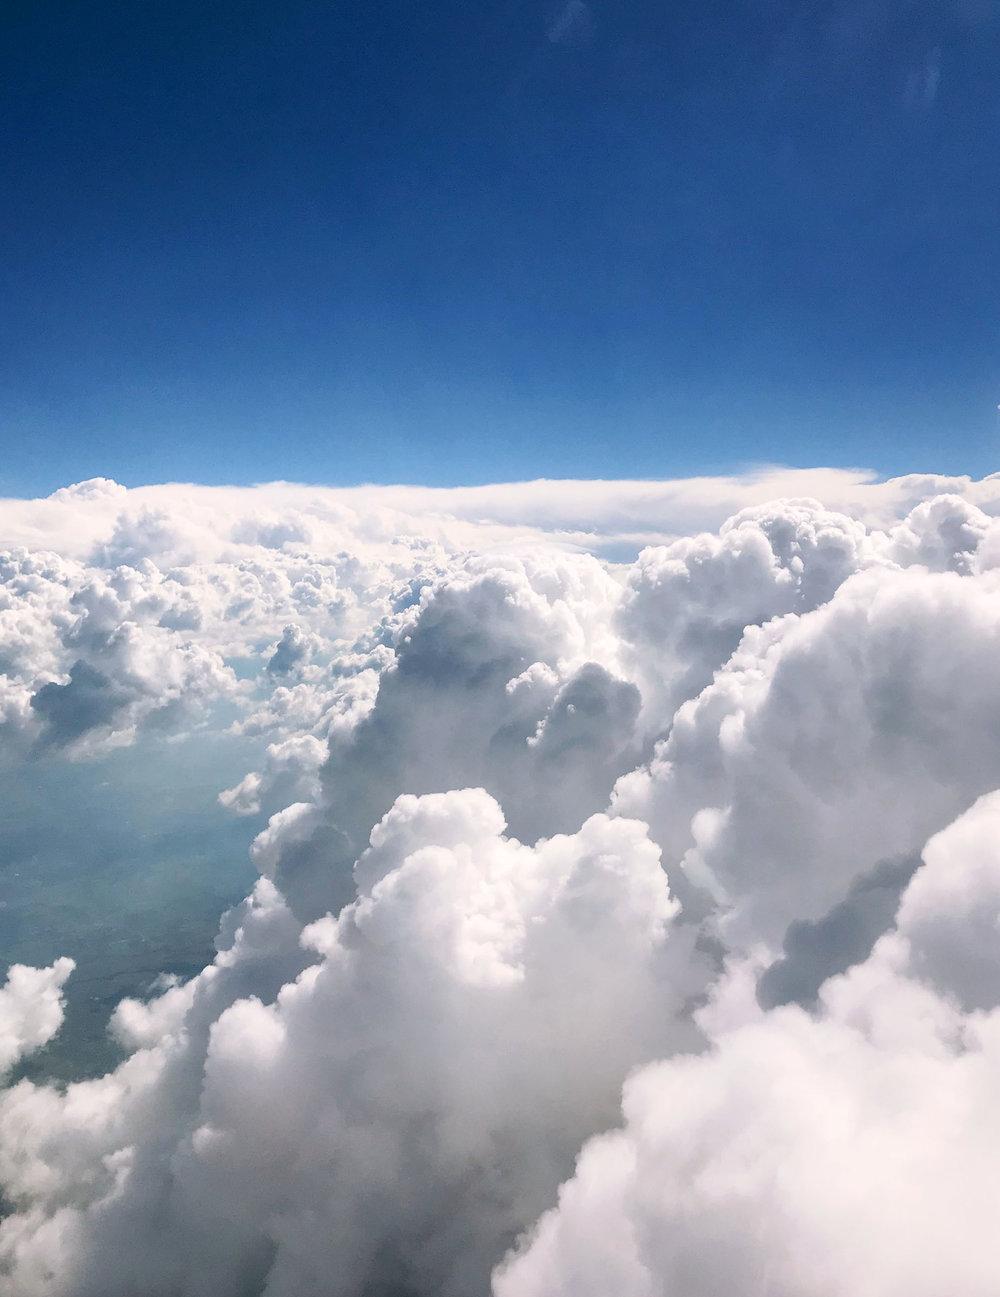 cdmx-01-clouds.jpg